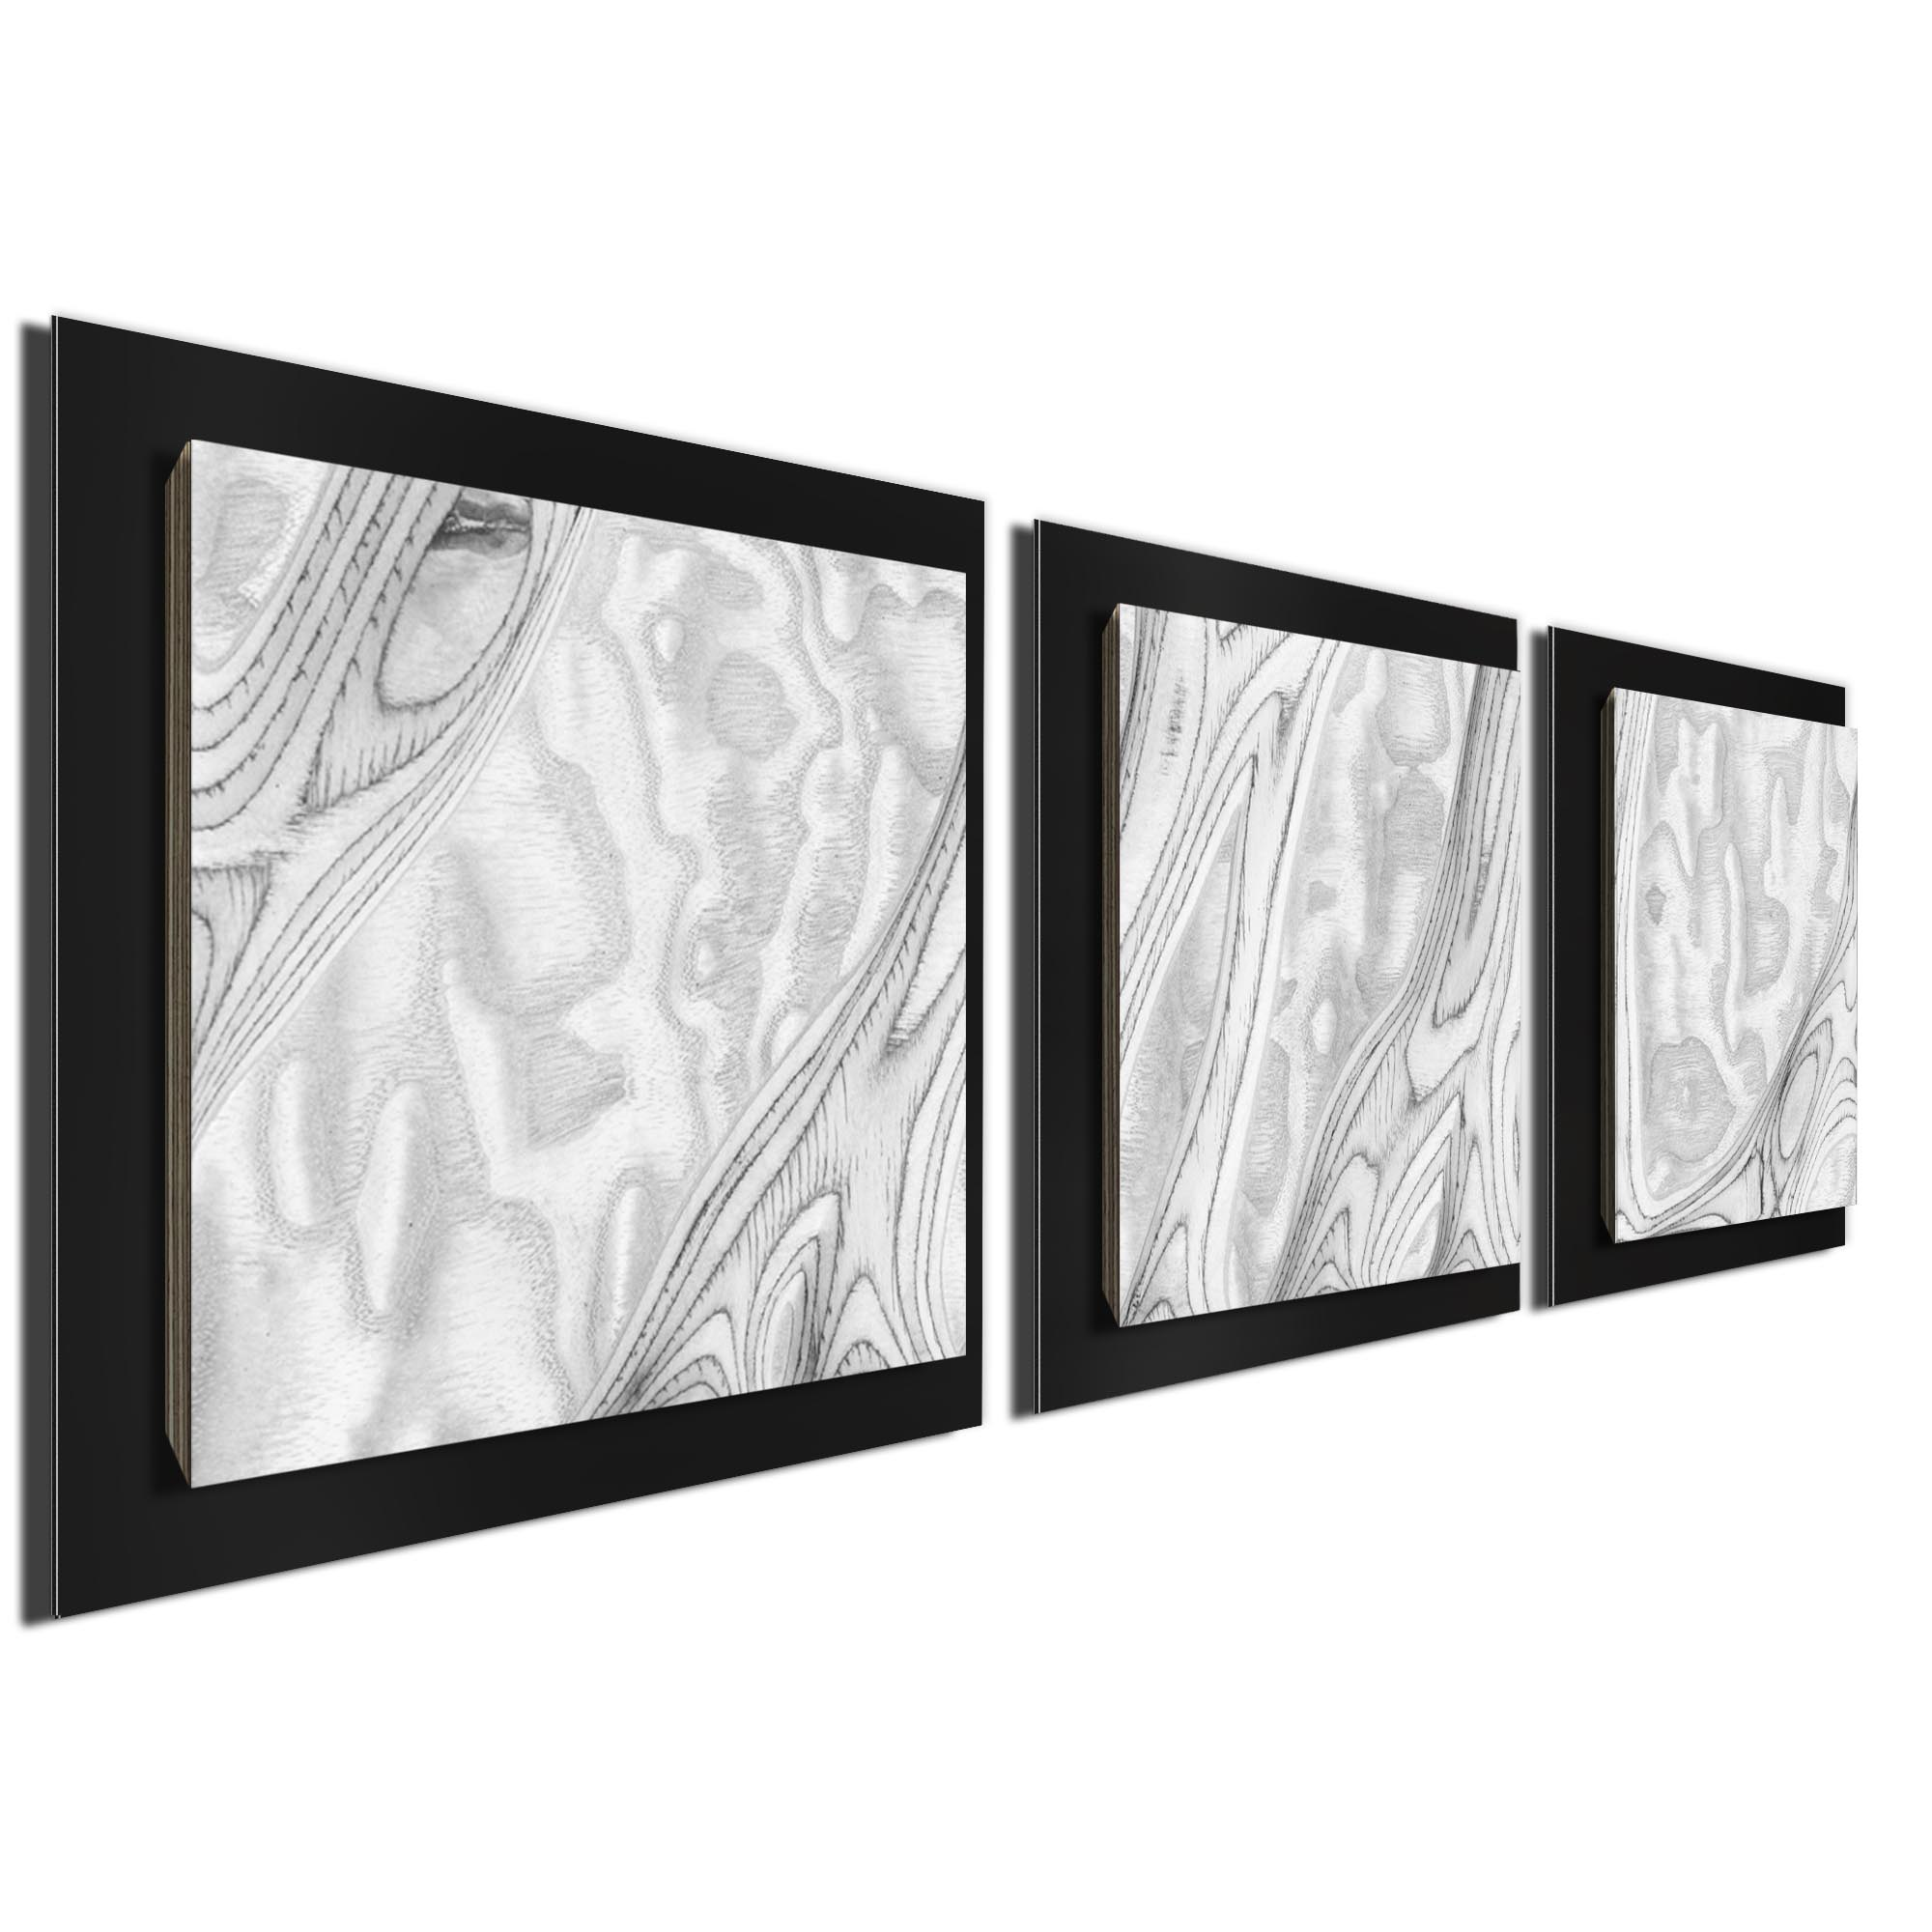 Whitewash Burl Essence Black by Jackson Wright Rustic Modern Style Wood Wall Art - Image 2